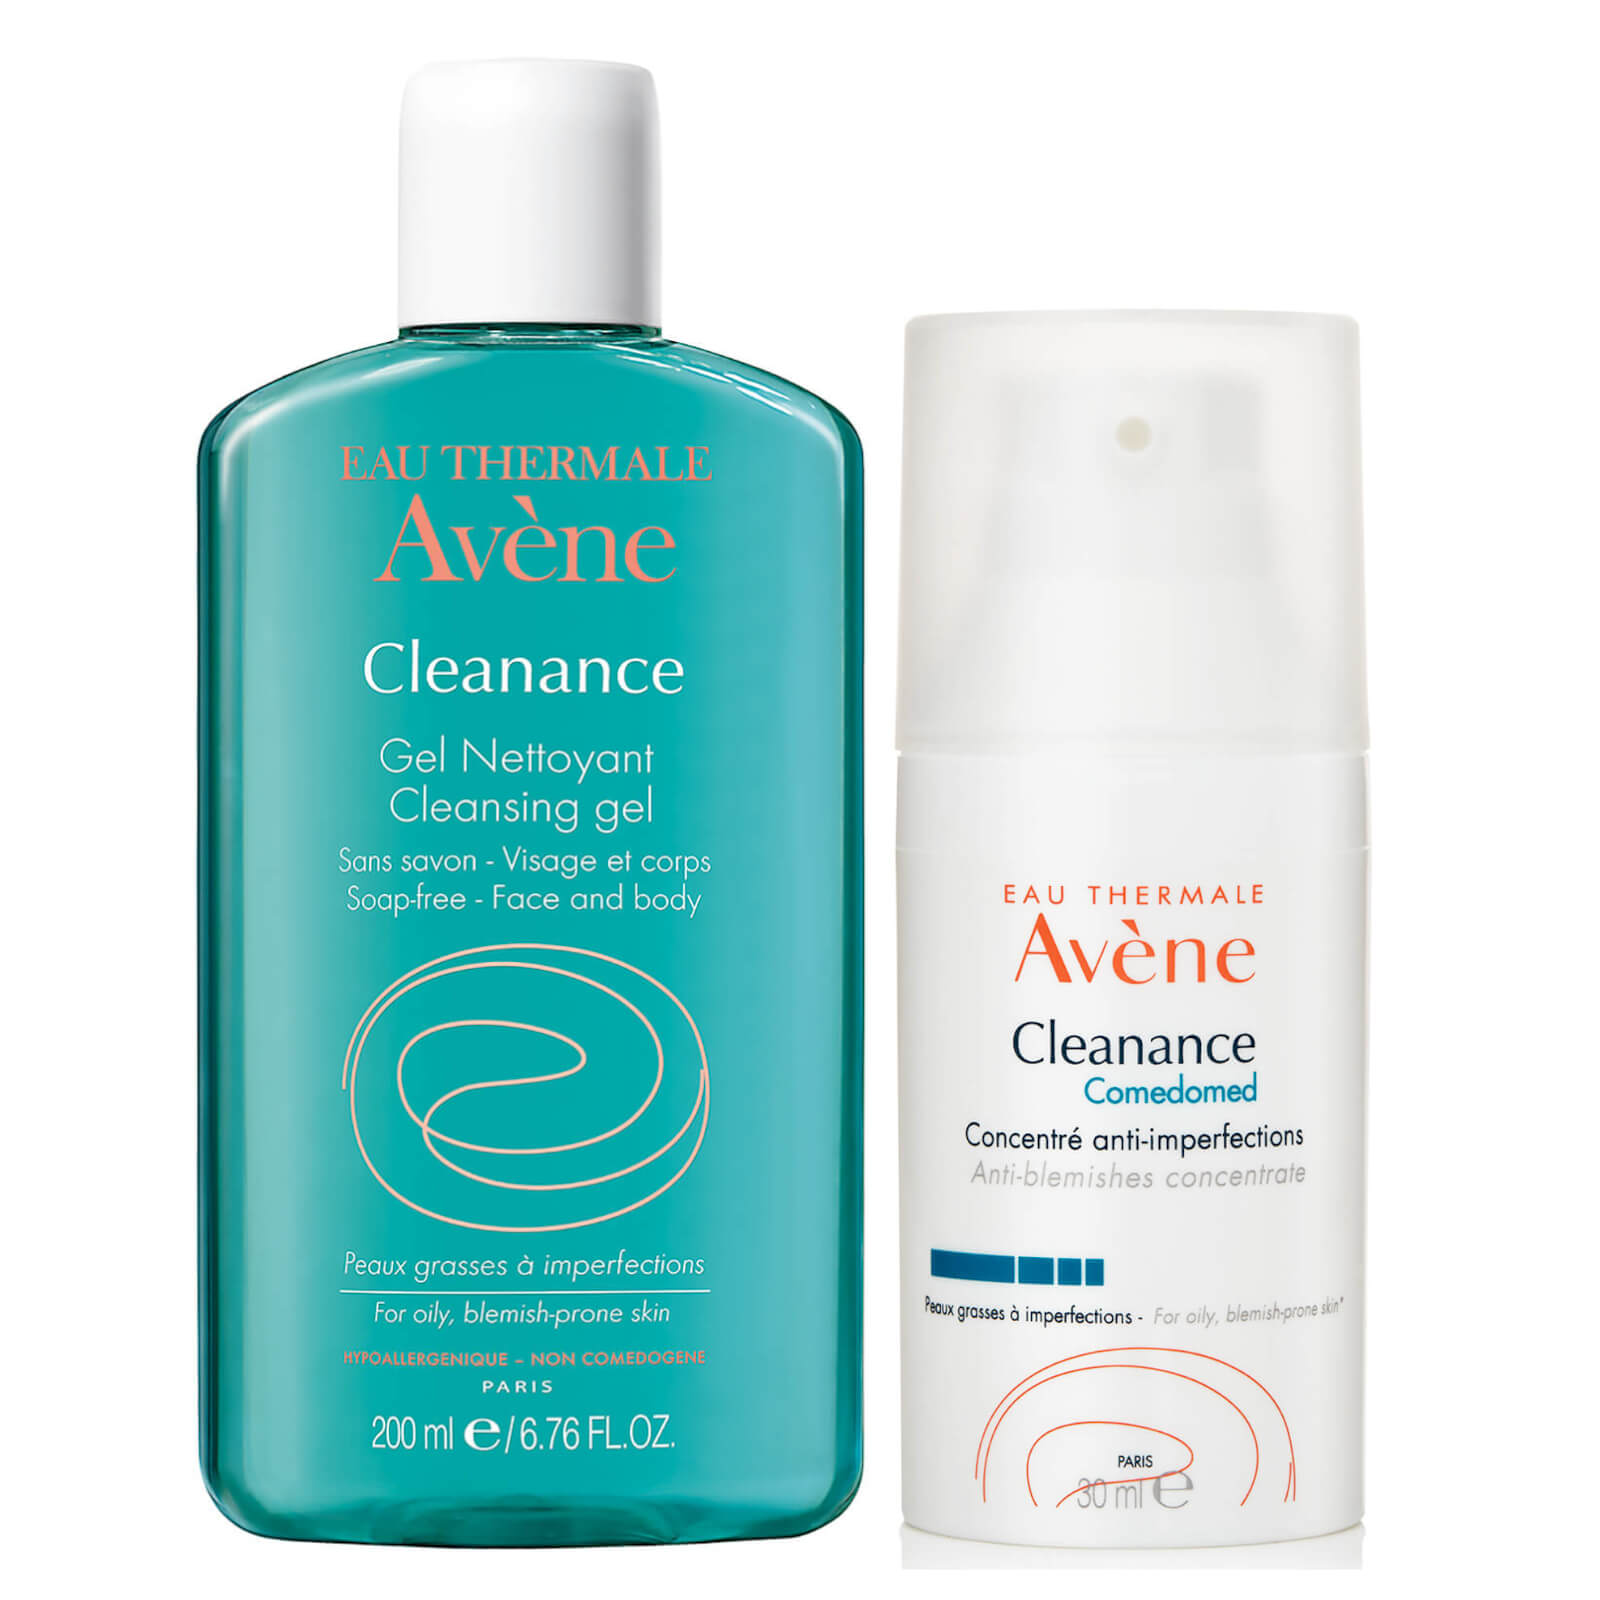 Avene Cleanance Duo